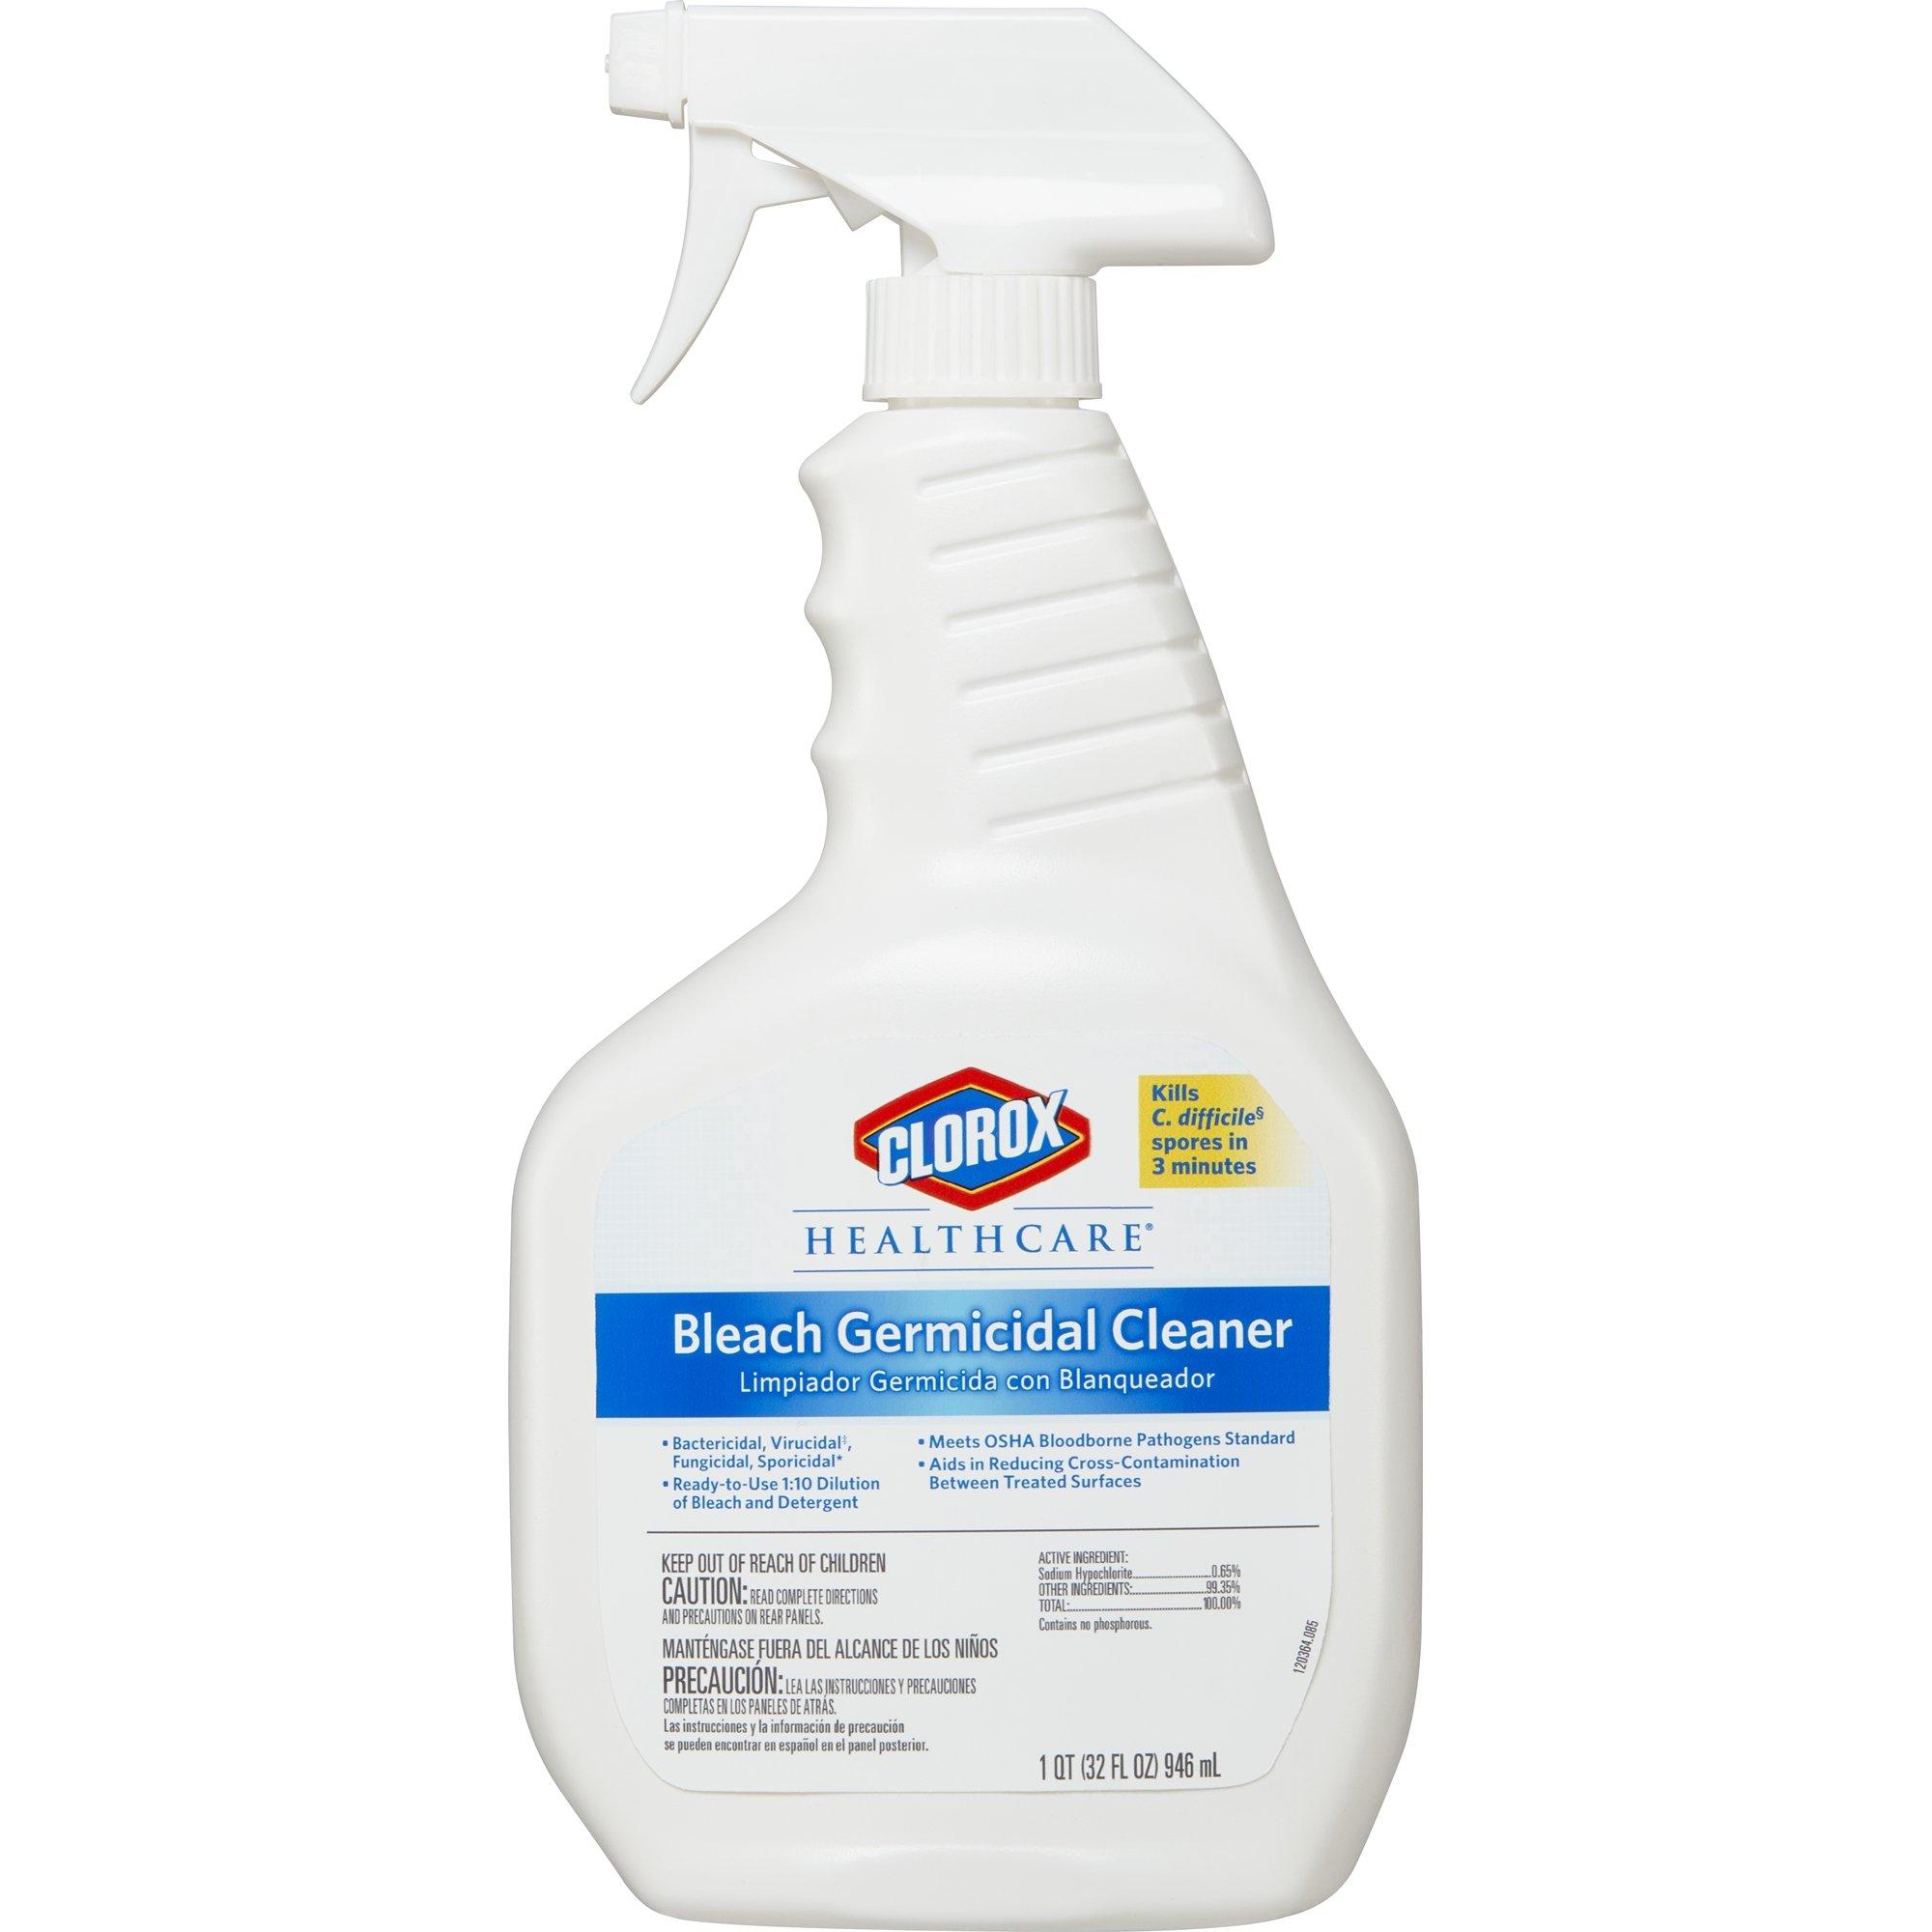 Clorox Healthcare Bleach Germicidal Cleaner Spray, 32 Ounces (For Healthcare Use) by Clorox (Image #1)